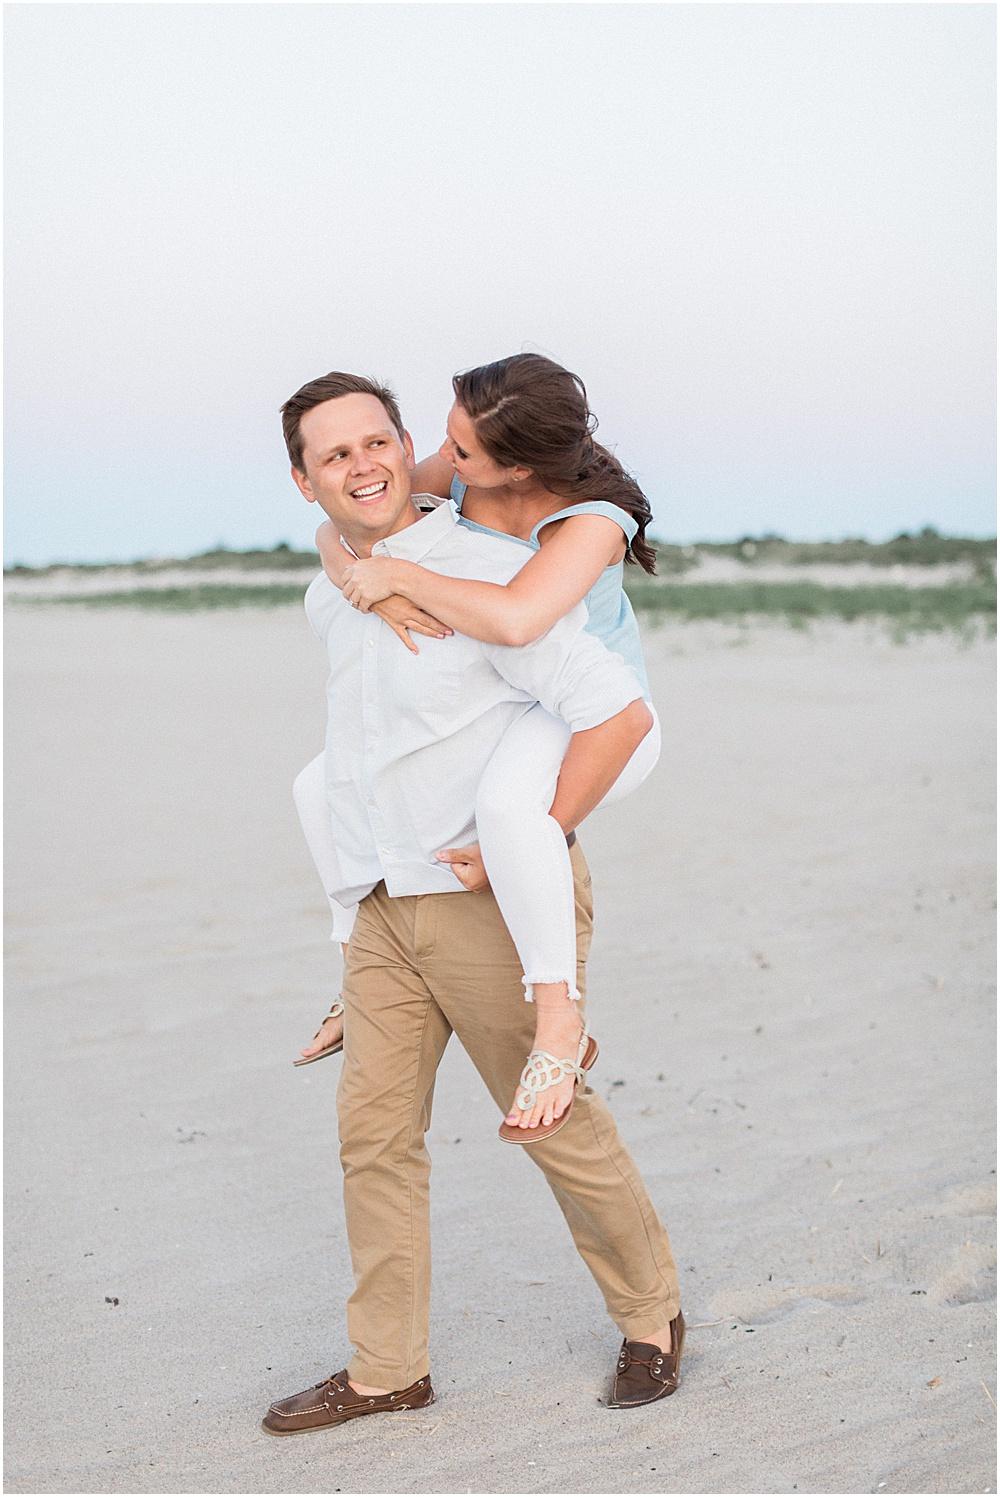 crane_estate_beach_engagement_ipswich_les_fleurs_andover_lyndsay_simon_beauty_massachusetts_boston_wedding_photographer_meredith_jane_photography_photo_0337.jpg